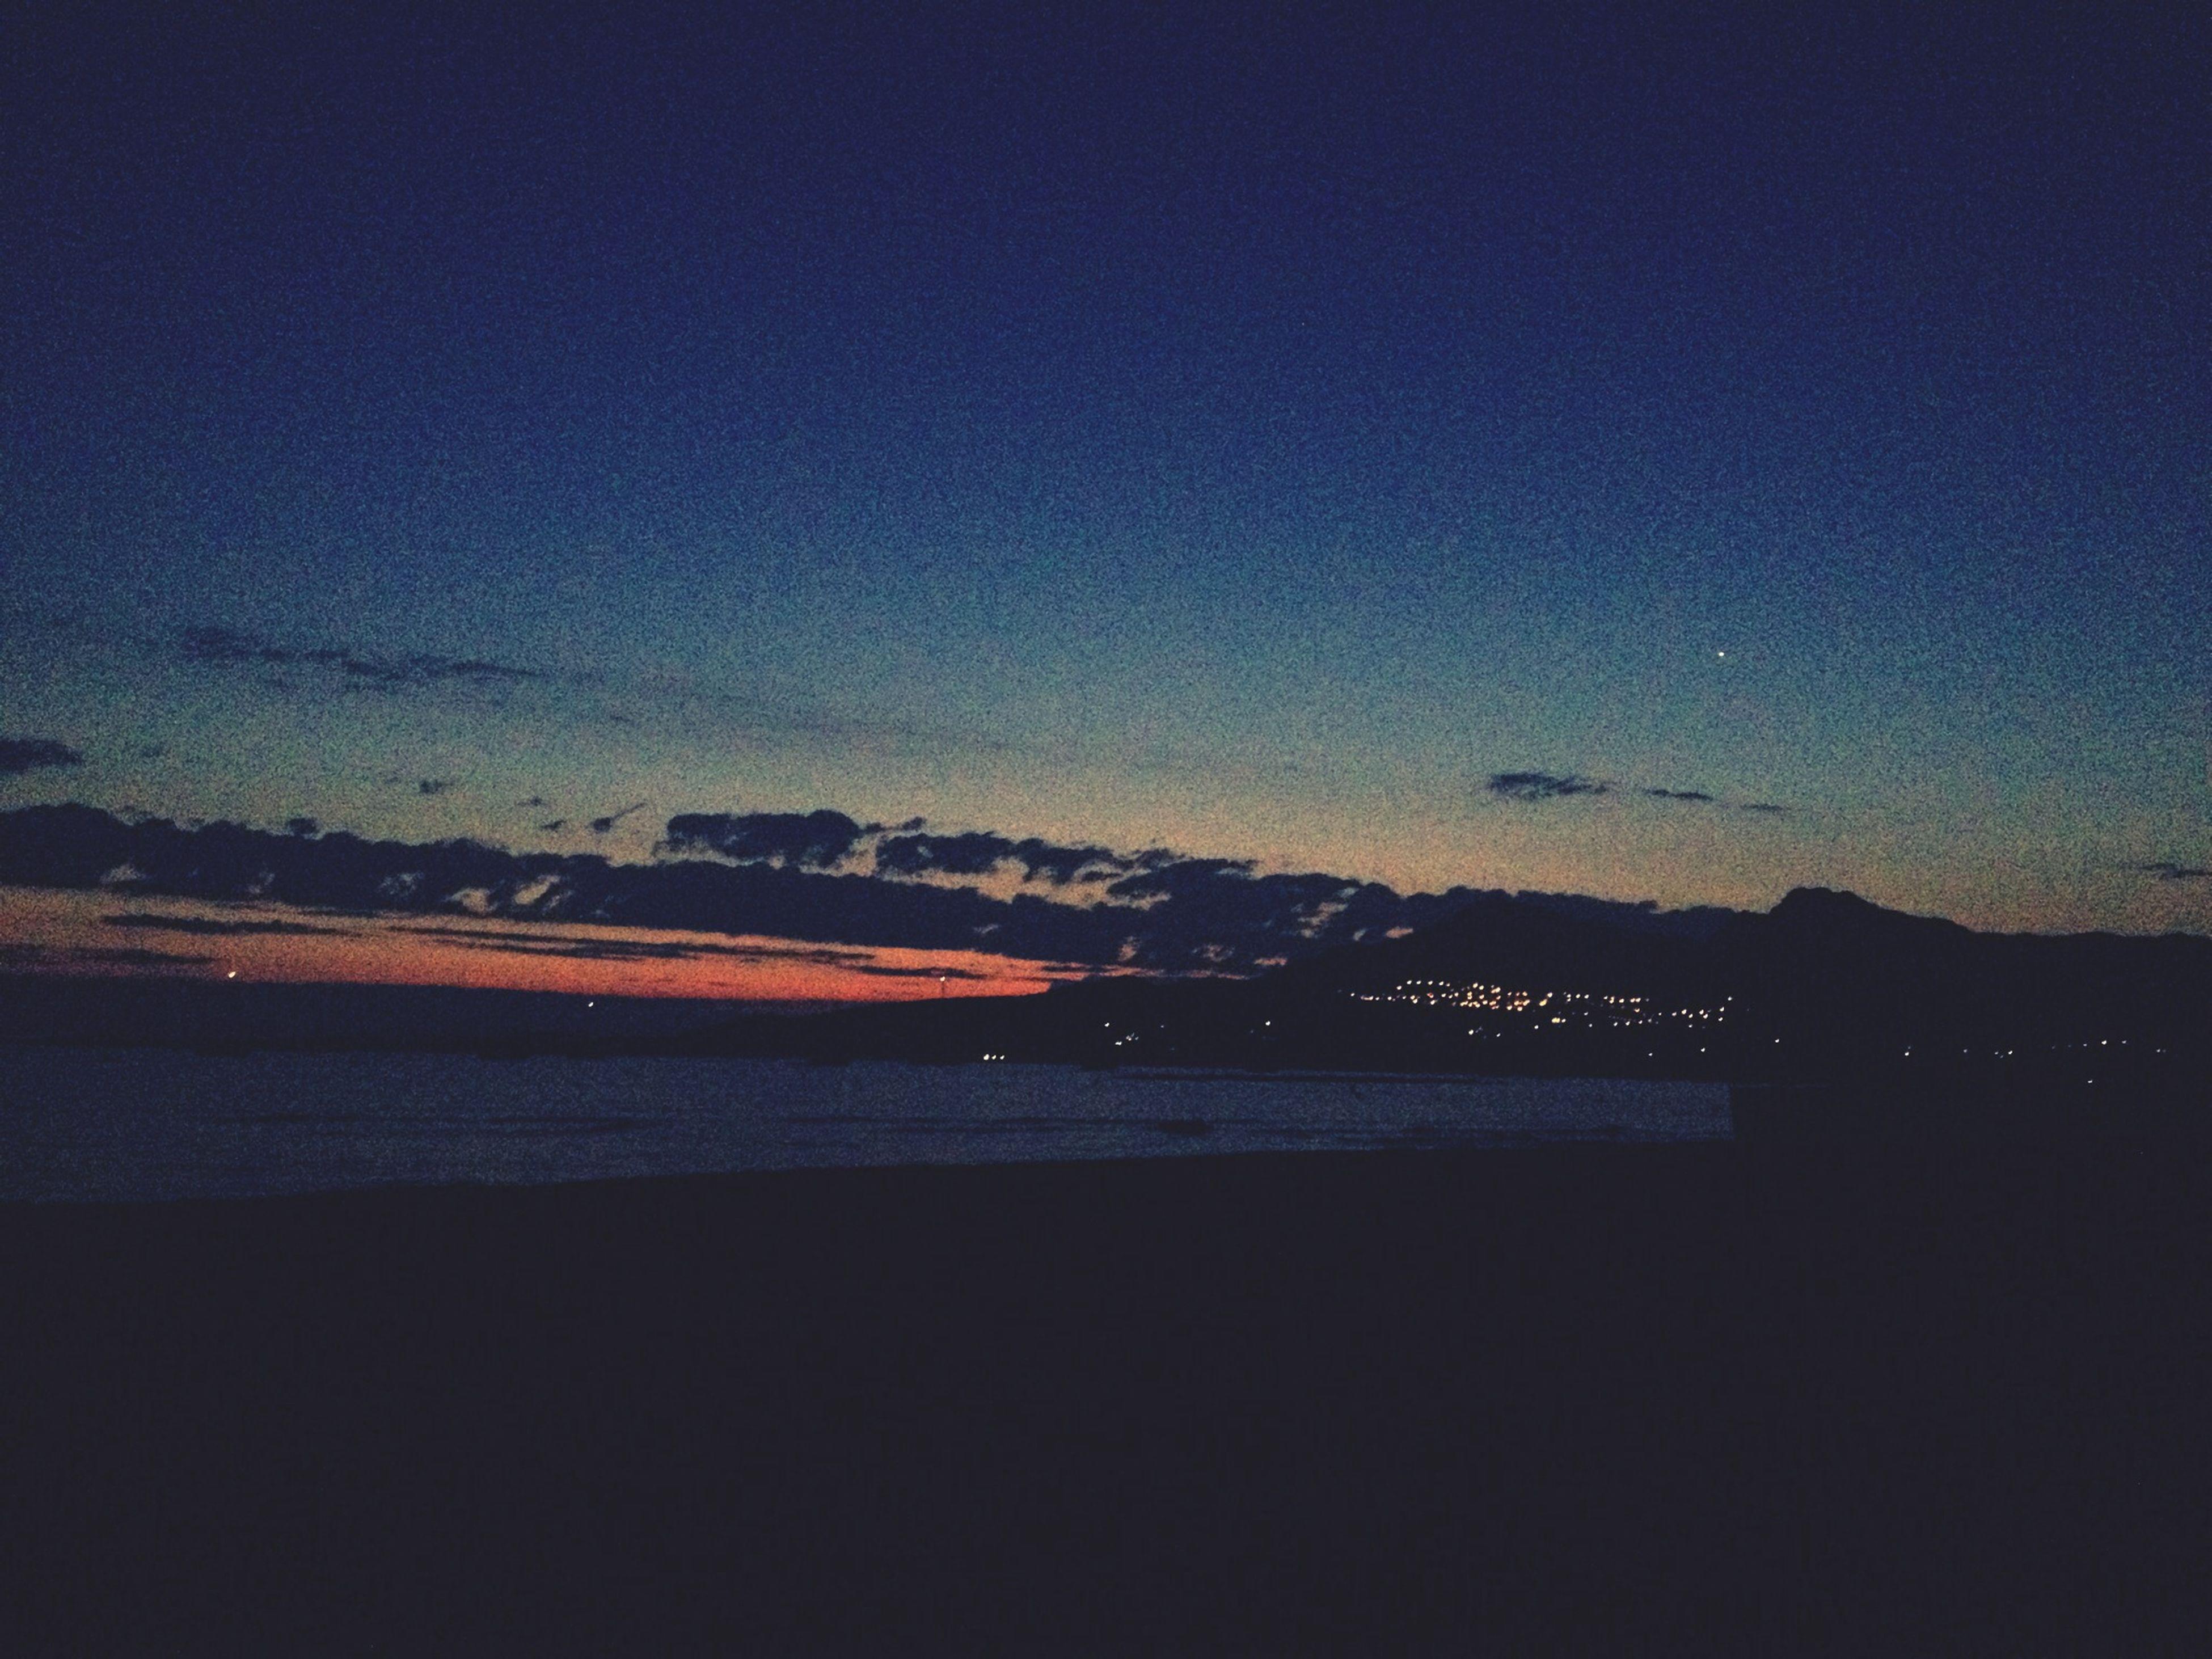 Night Landscape Corsican Paradise 5oclocksomewhere